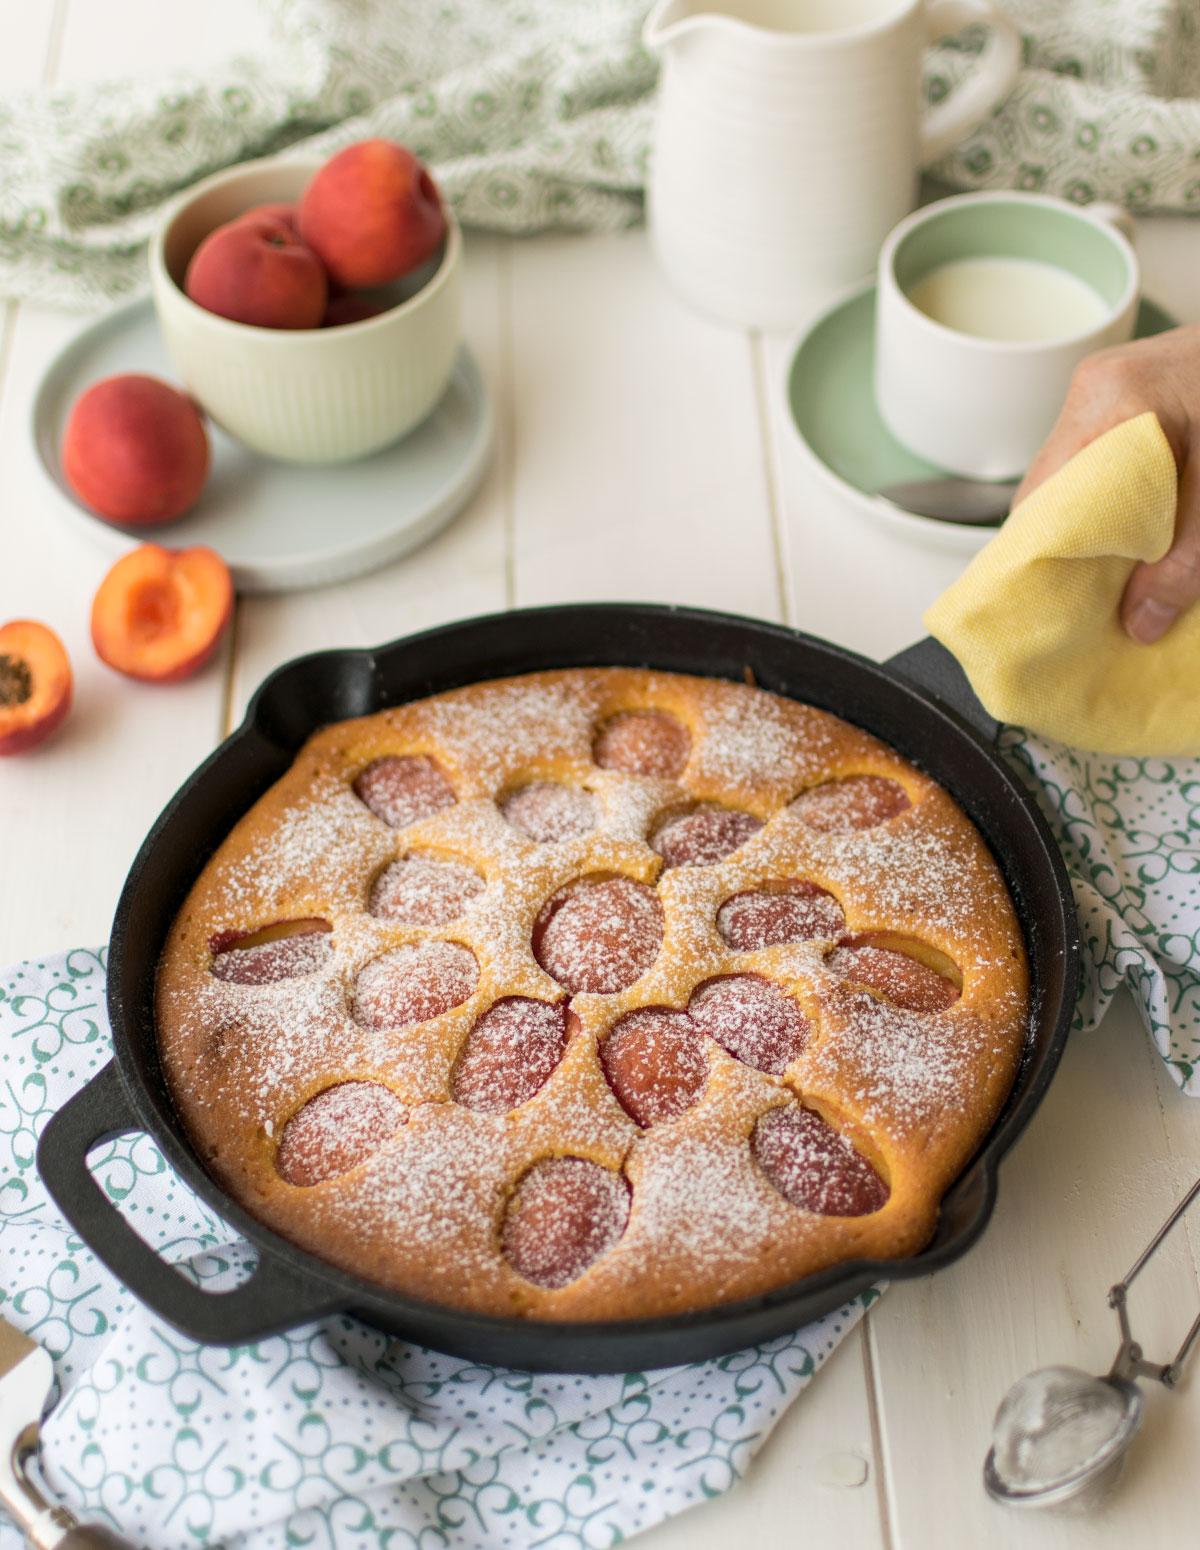 torta_albicocche_rosse_ricetta